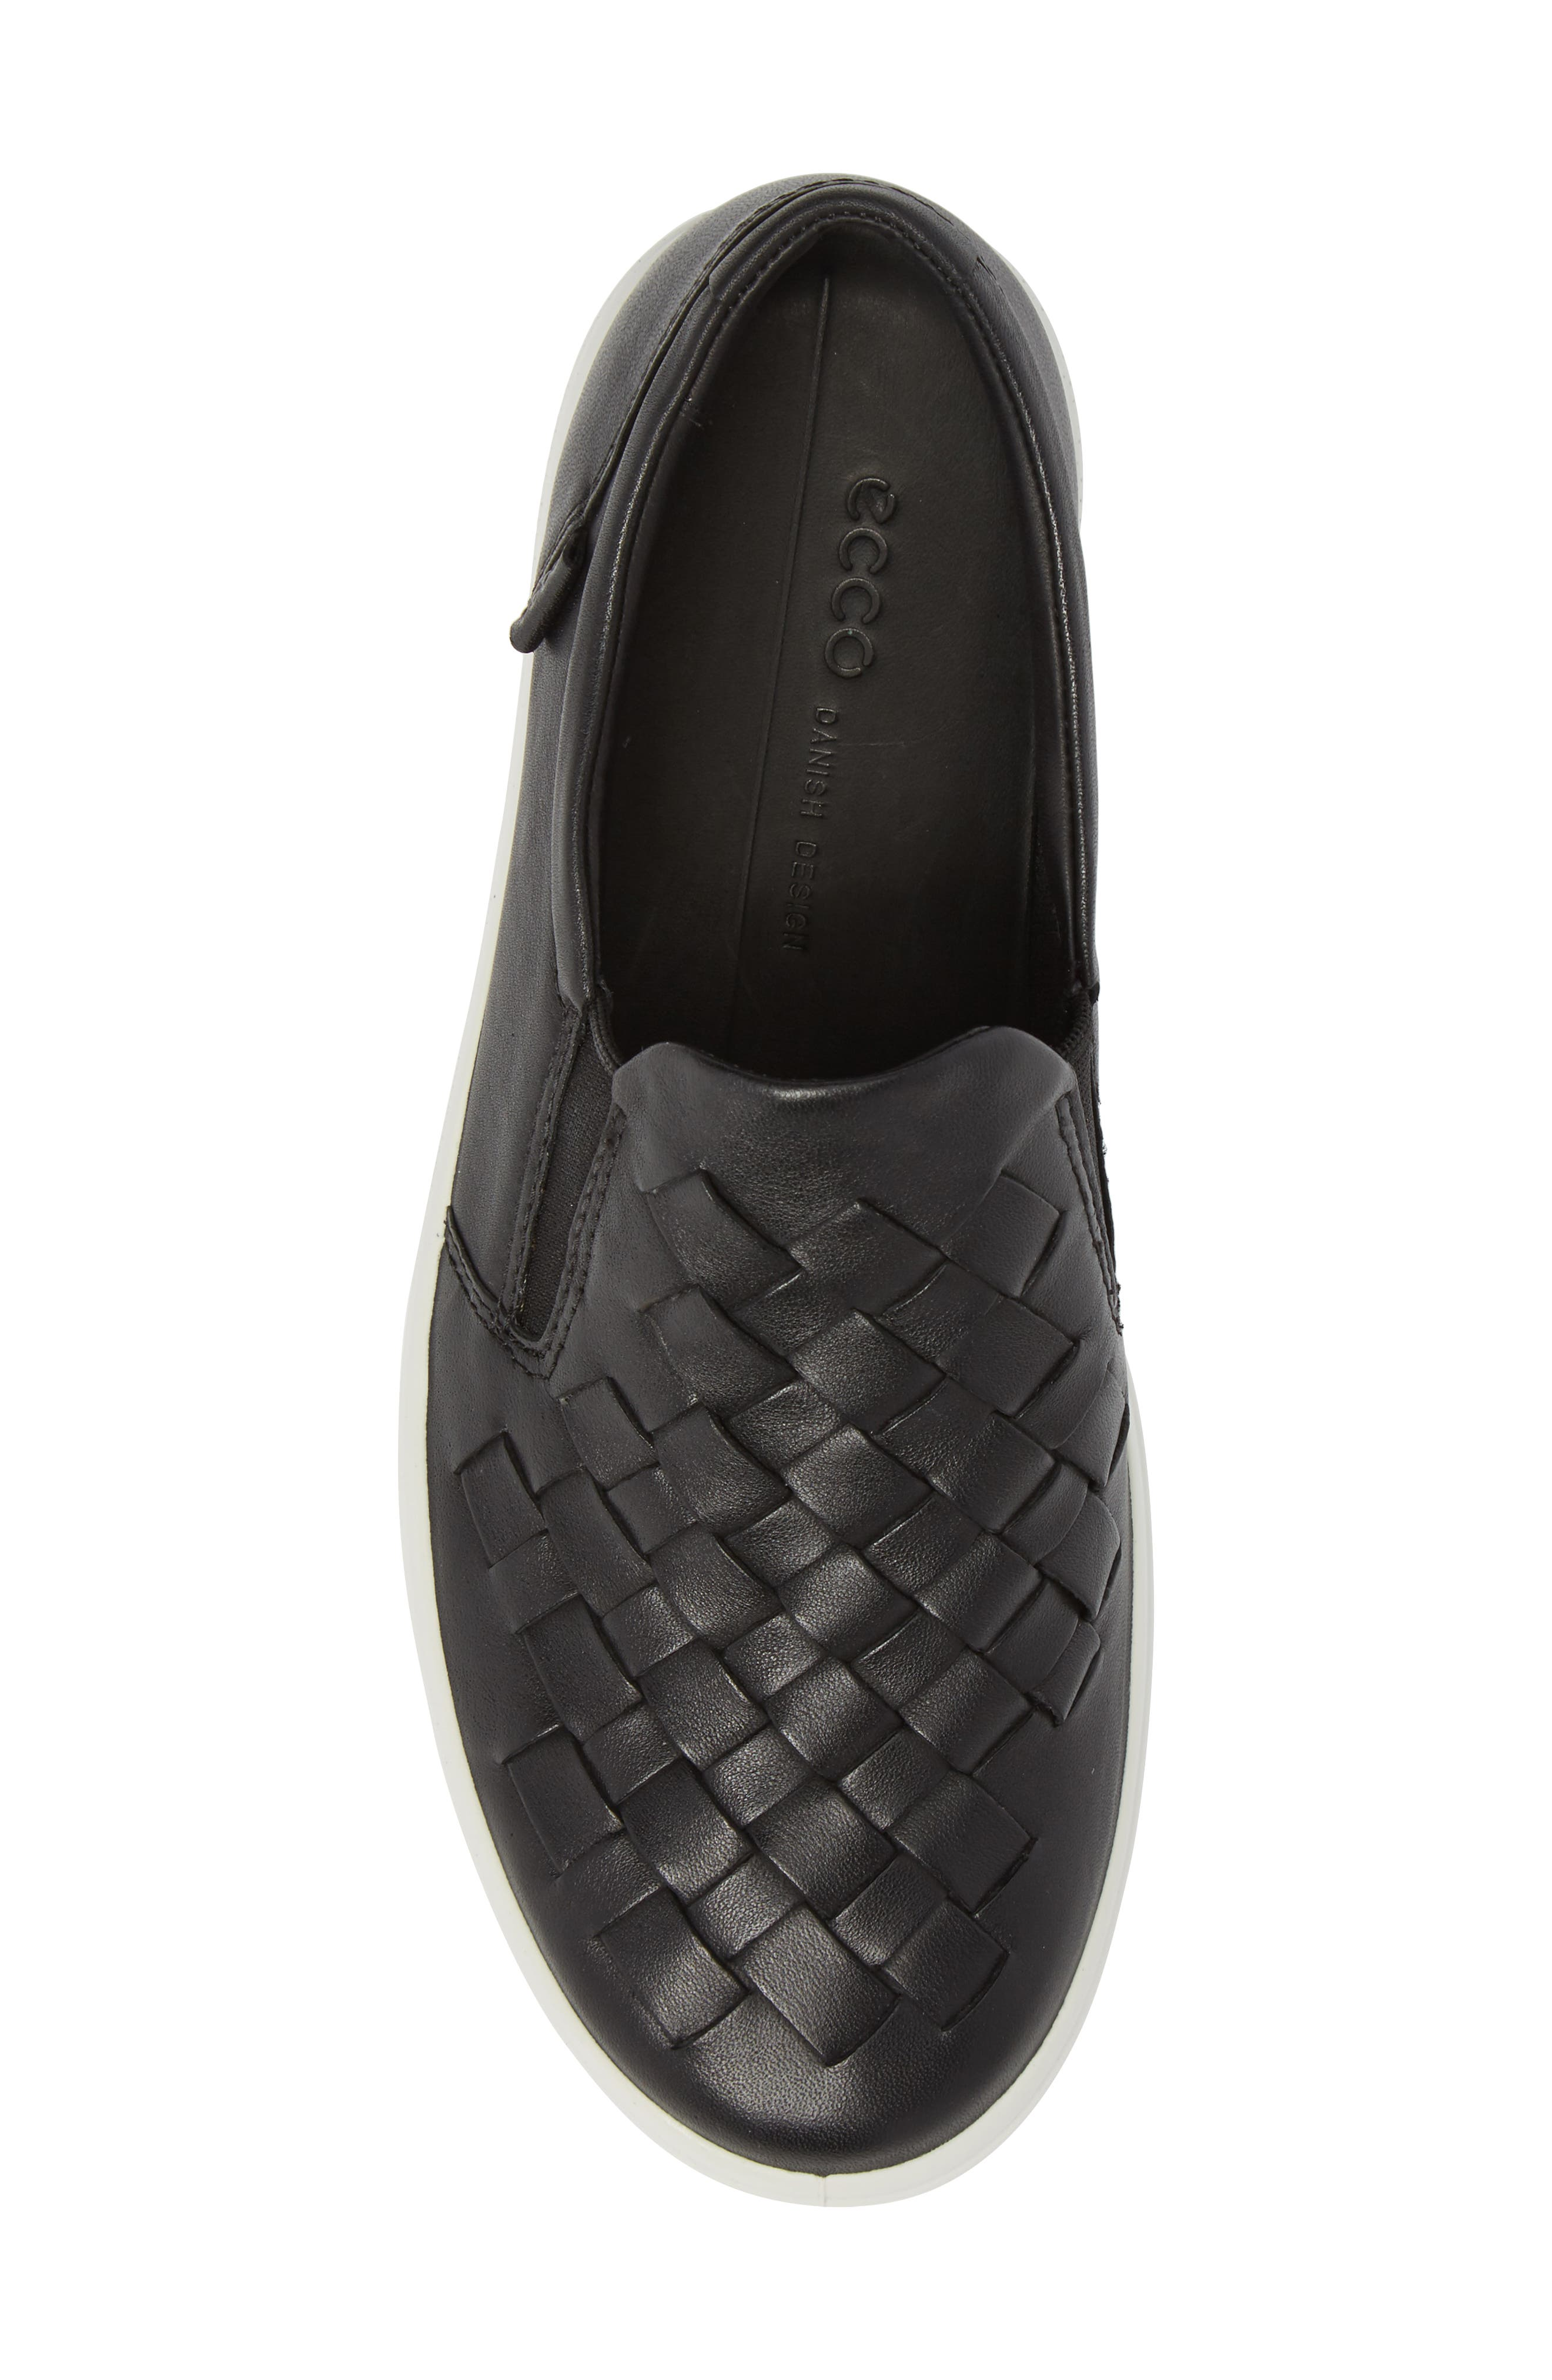 ECO Soft 7 Woven Slip-On Sneaker,                             Alternate thumbnail 5, color,                             Black Leather